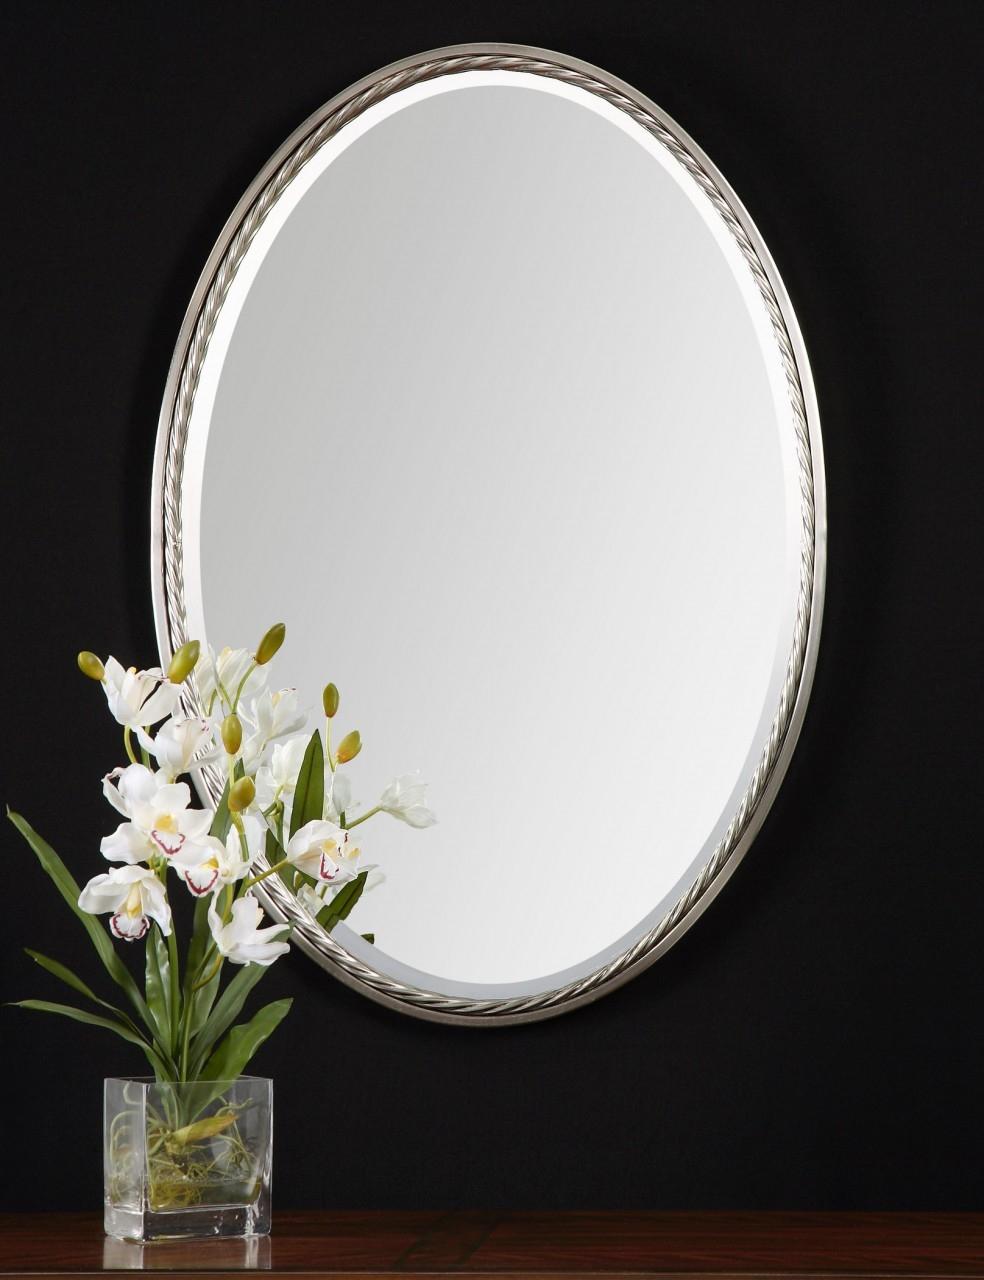 Oval Brushed Nickel Mirror For Bathroom